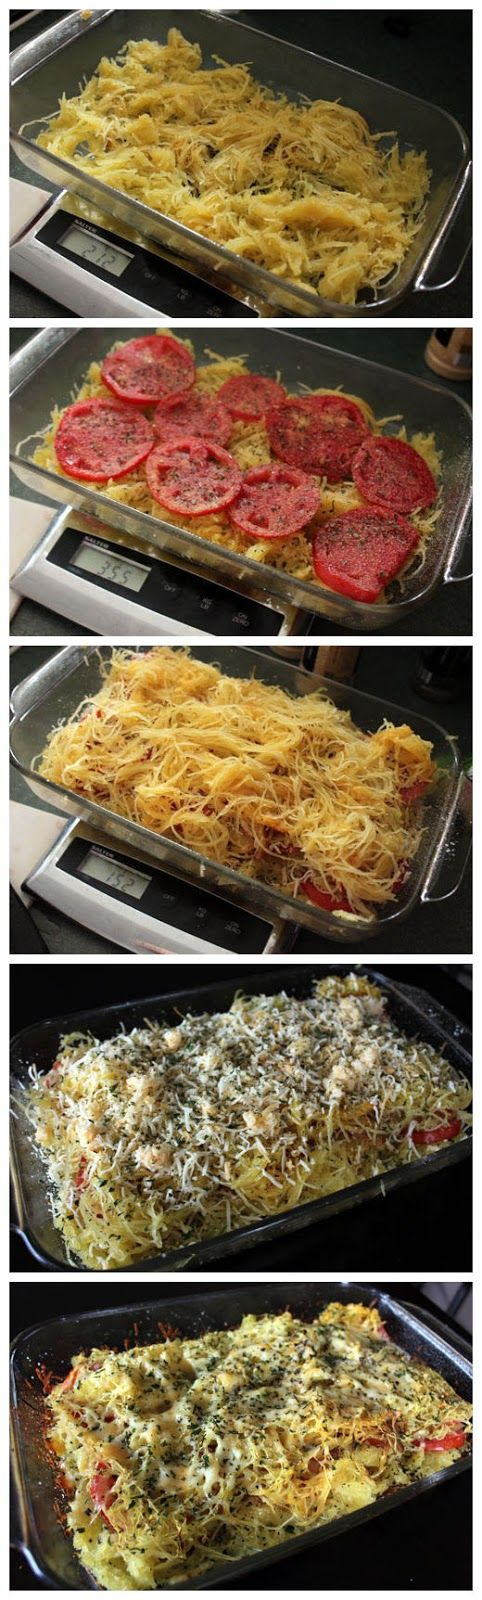 kiss recipe: Spaghetti Squash and Tomato Bake